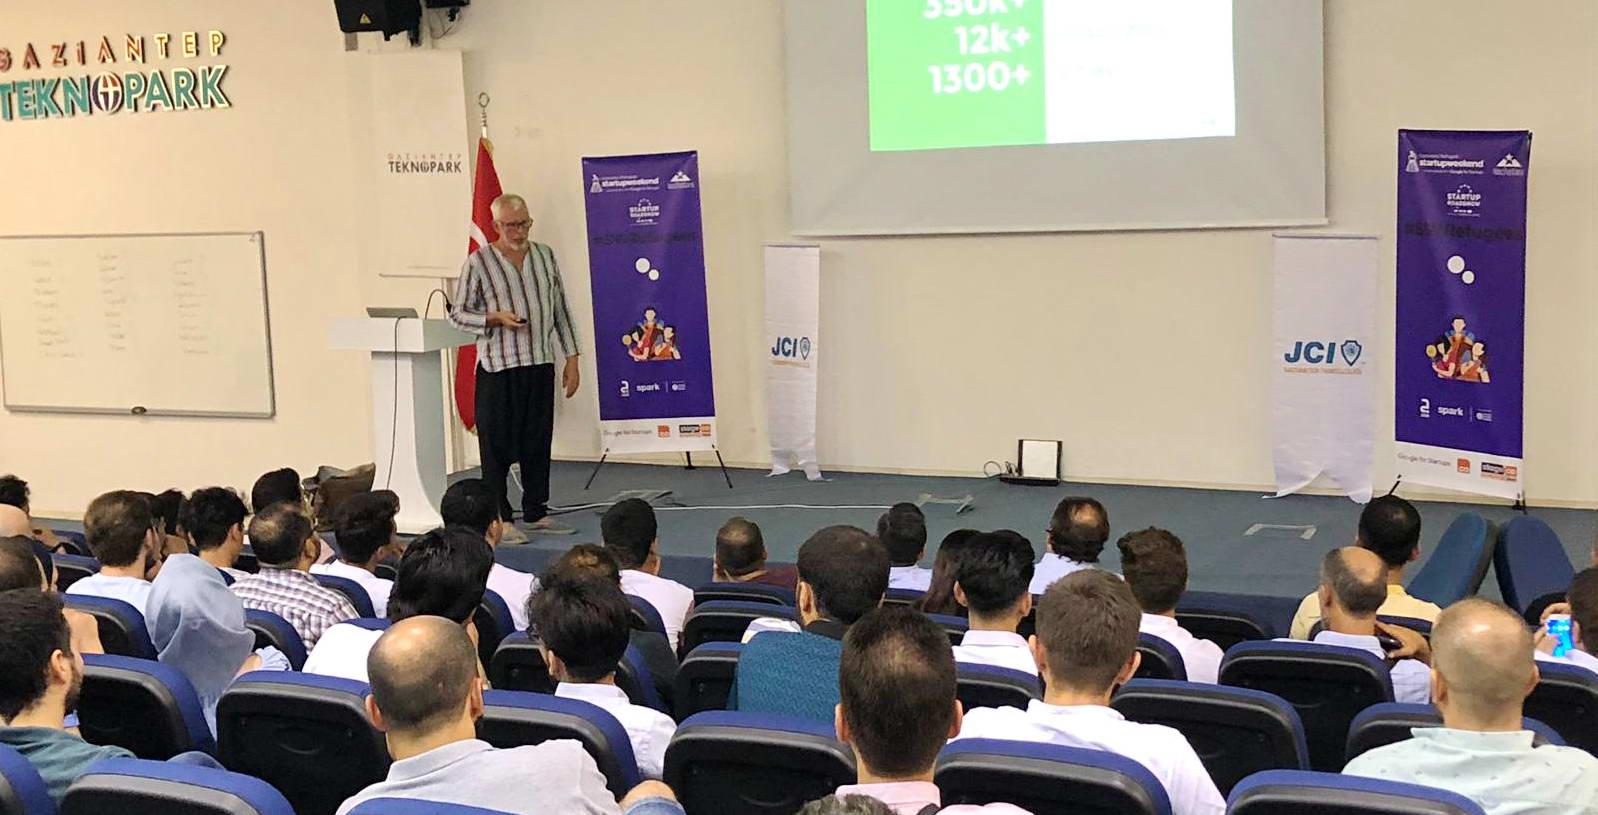 Startup Weekend, Gaziantep TEKNOPARK'ta Gerçekleşti -  (4)